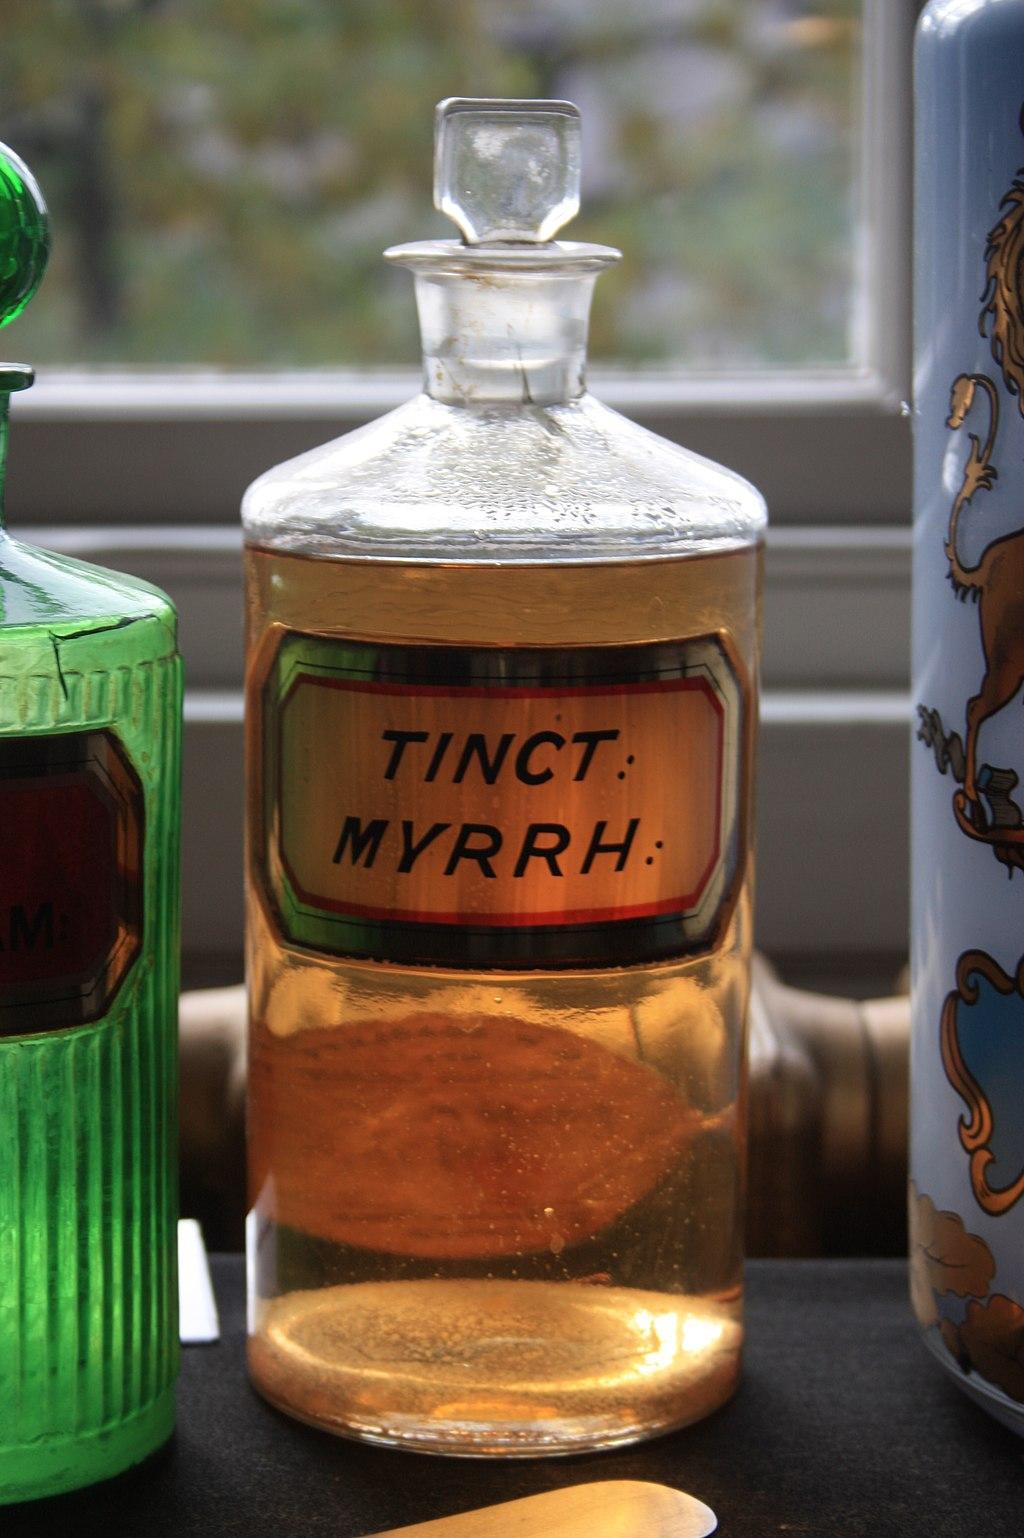 1024px-An_old_bottle_of_Tincture_of_Myrrh